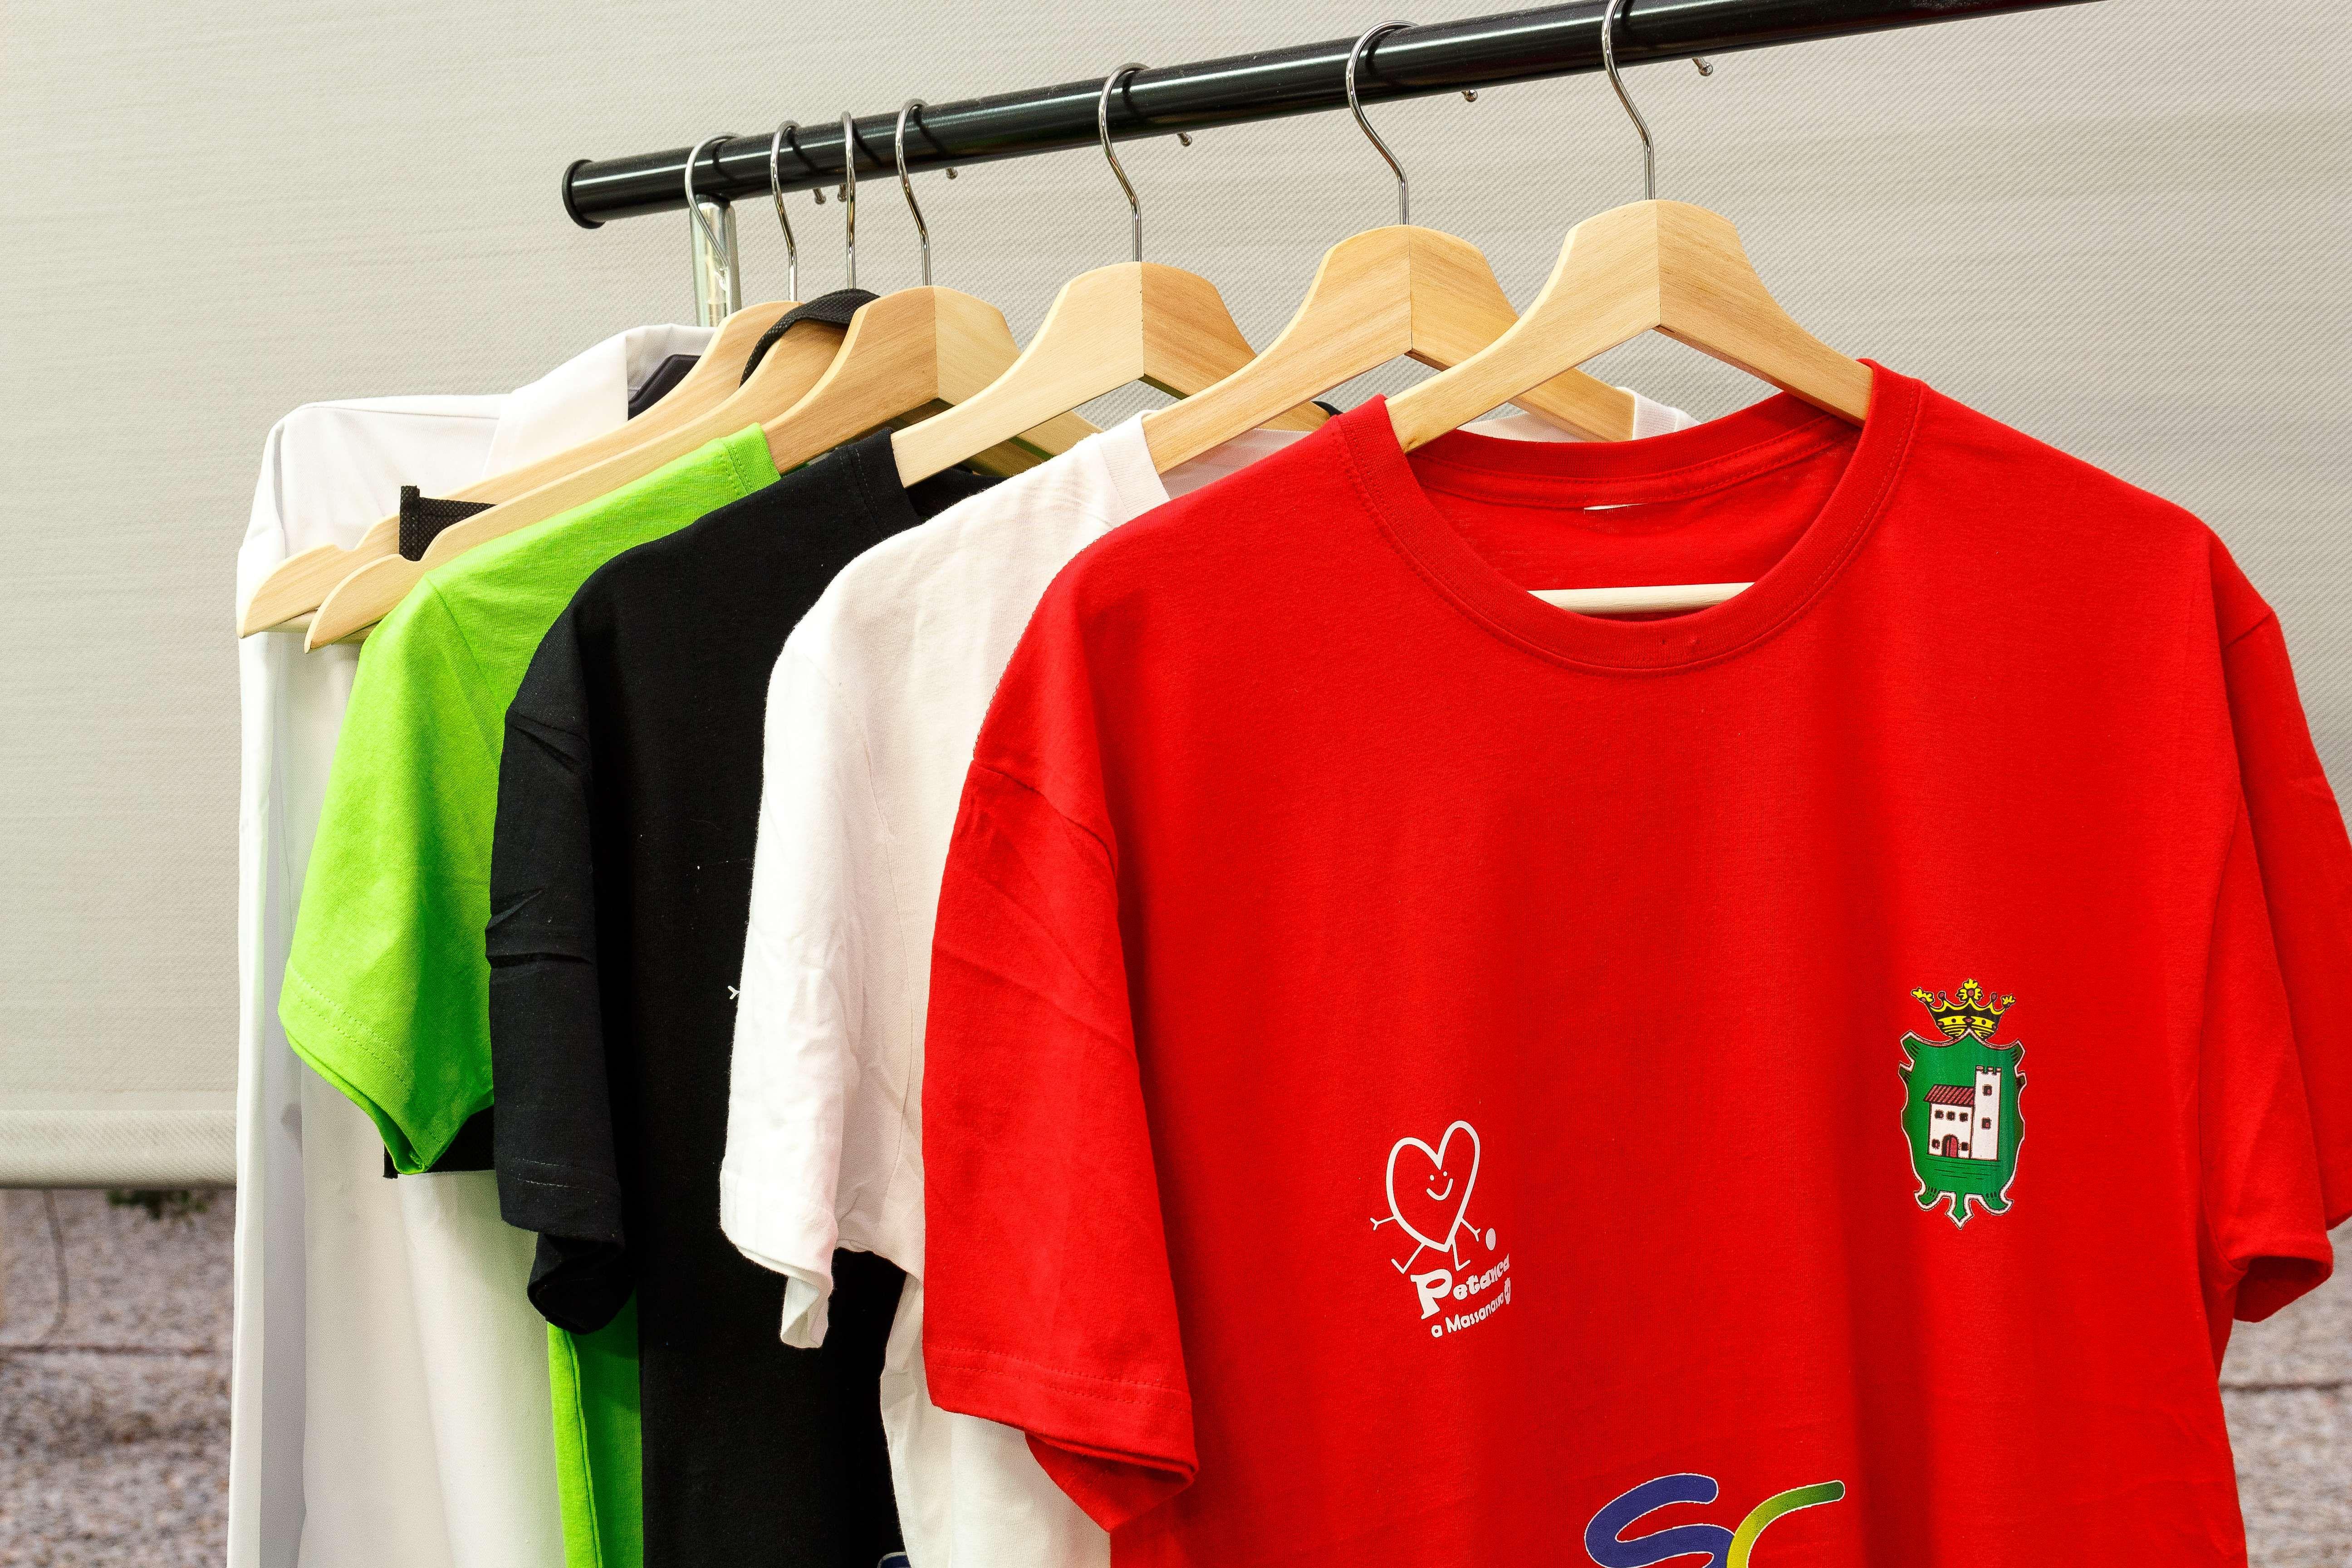 Serigrafía en camisetas en Valencia d70cd99d81e20